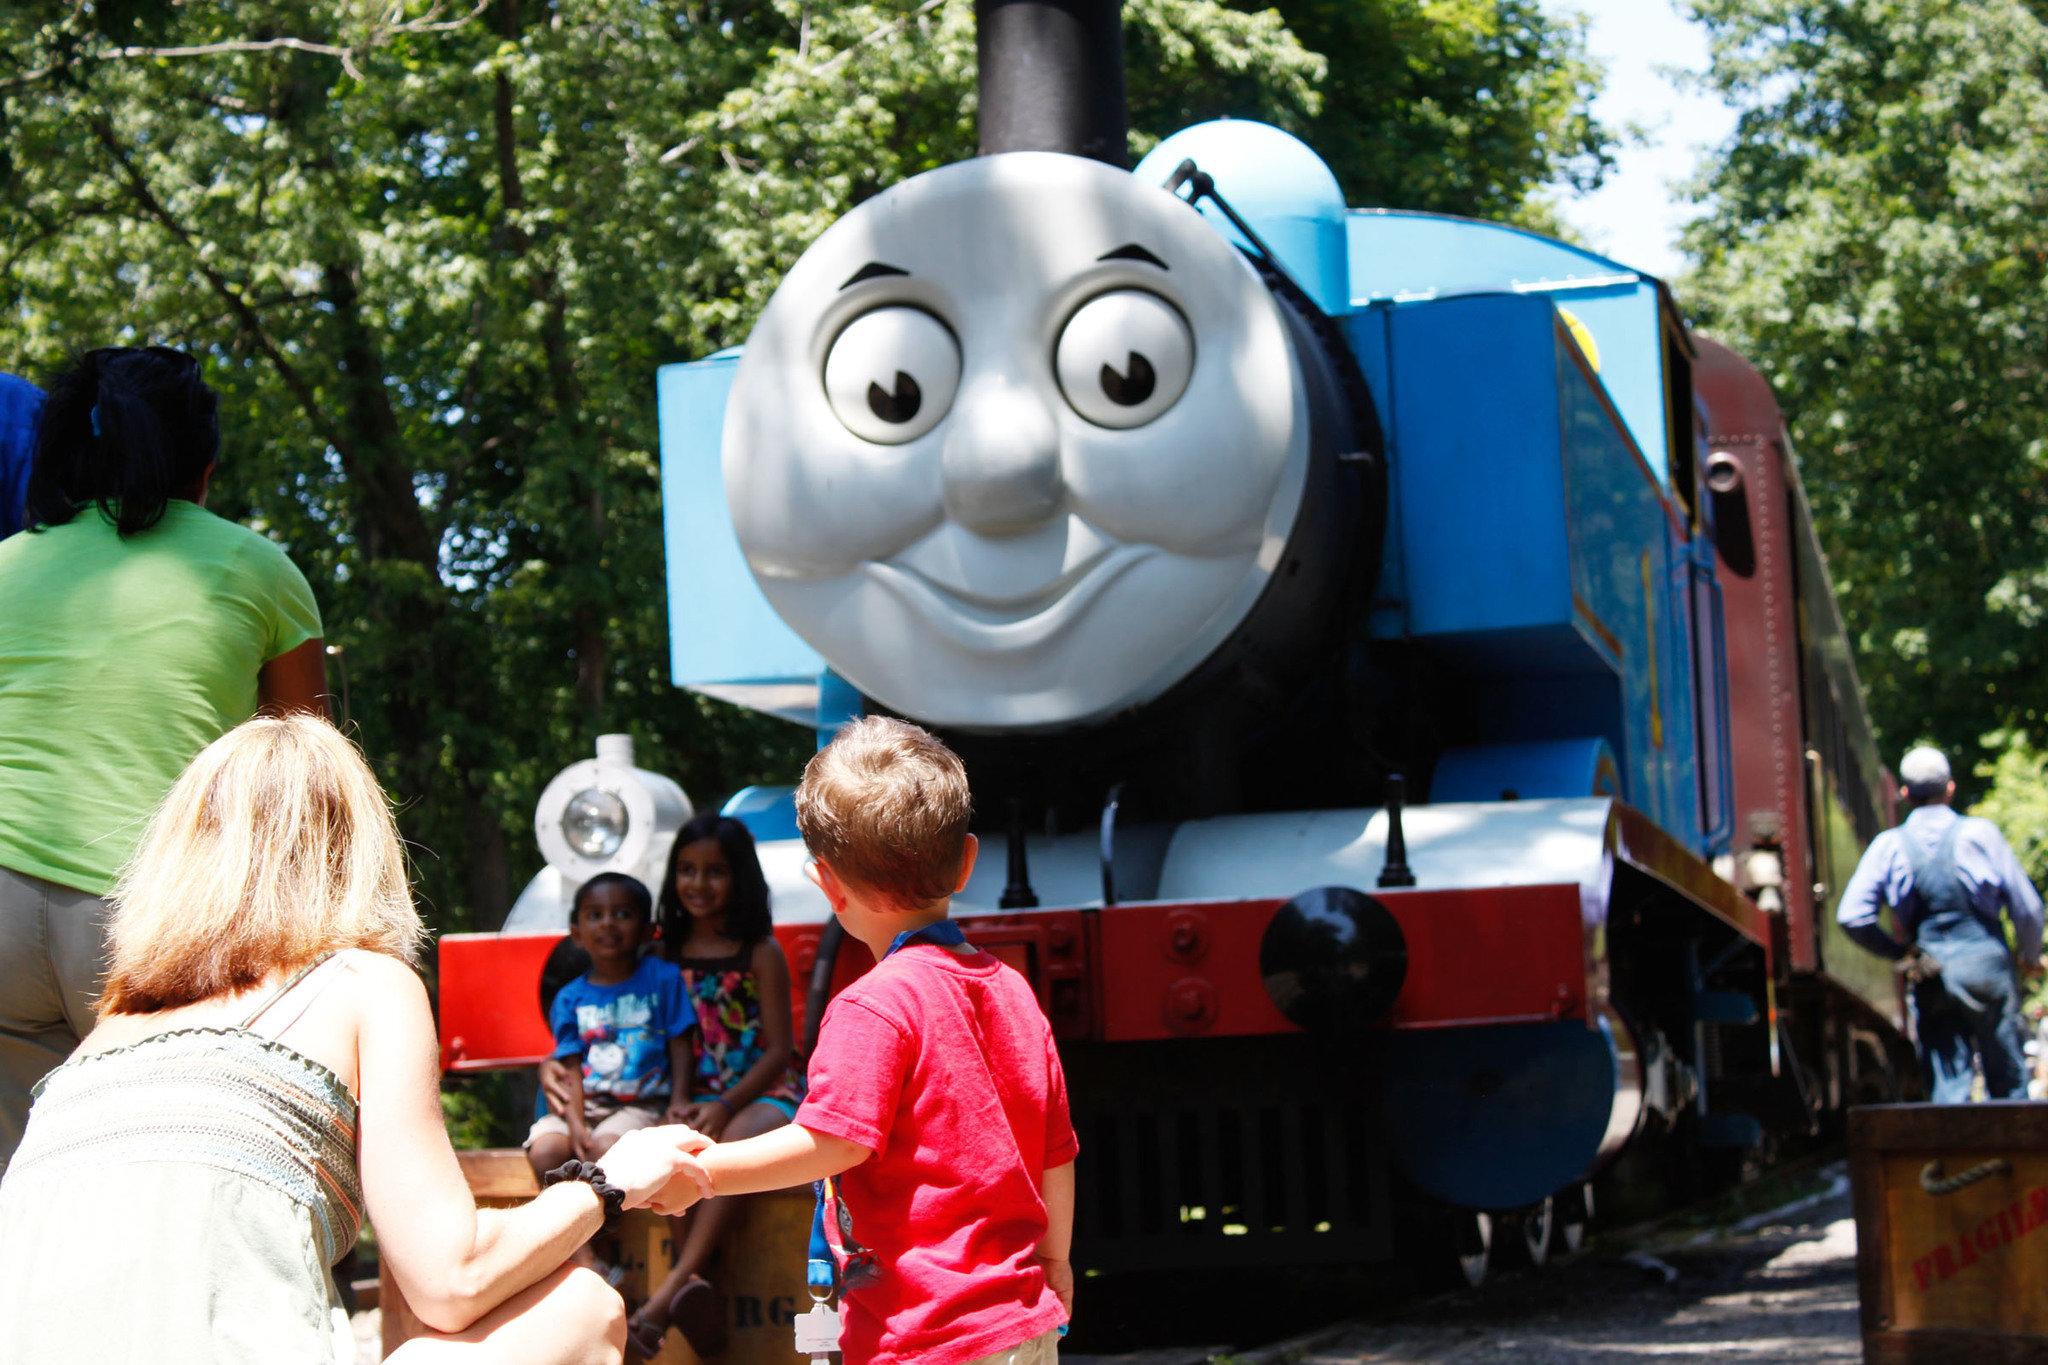 Thomas The Tank Engine Returning To Phillipsburg This Summer